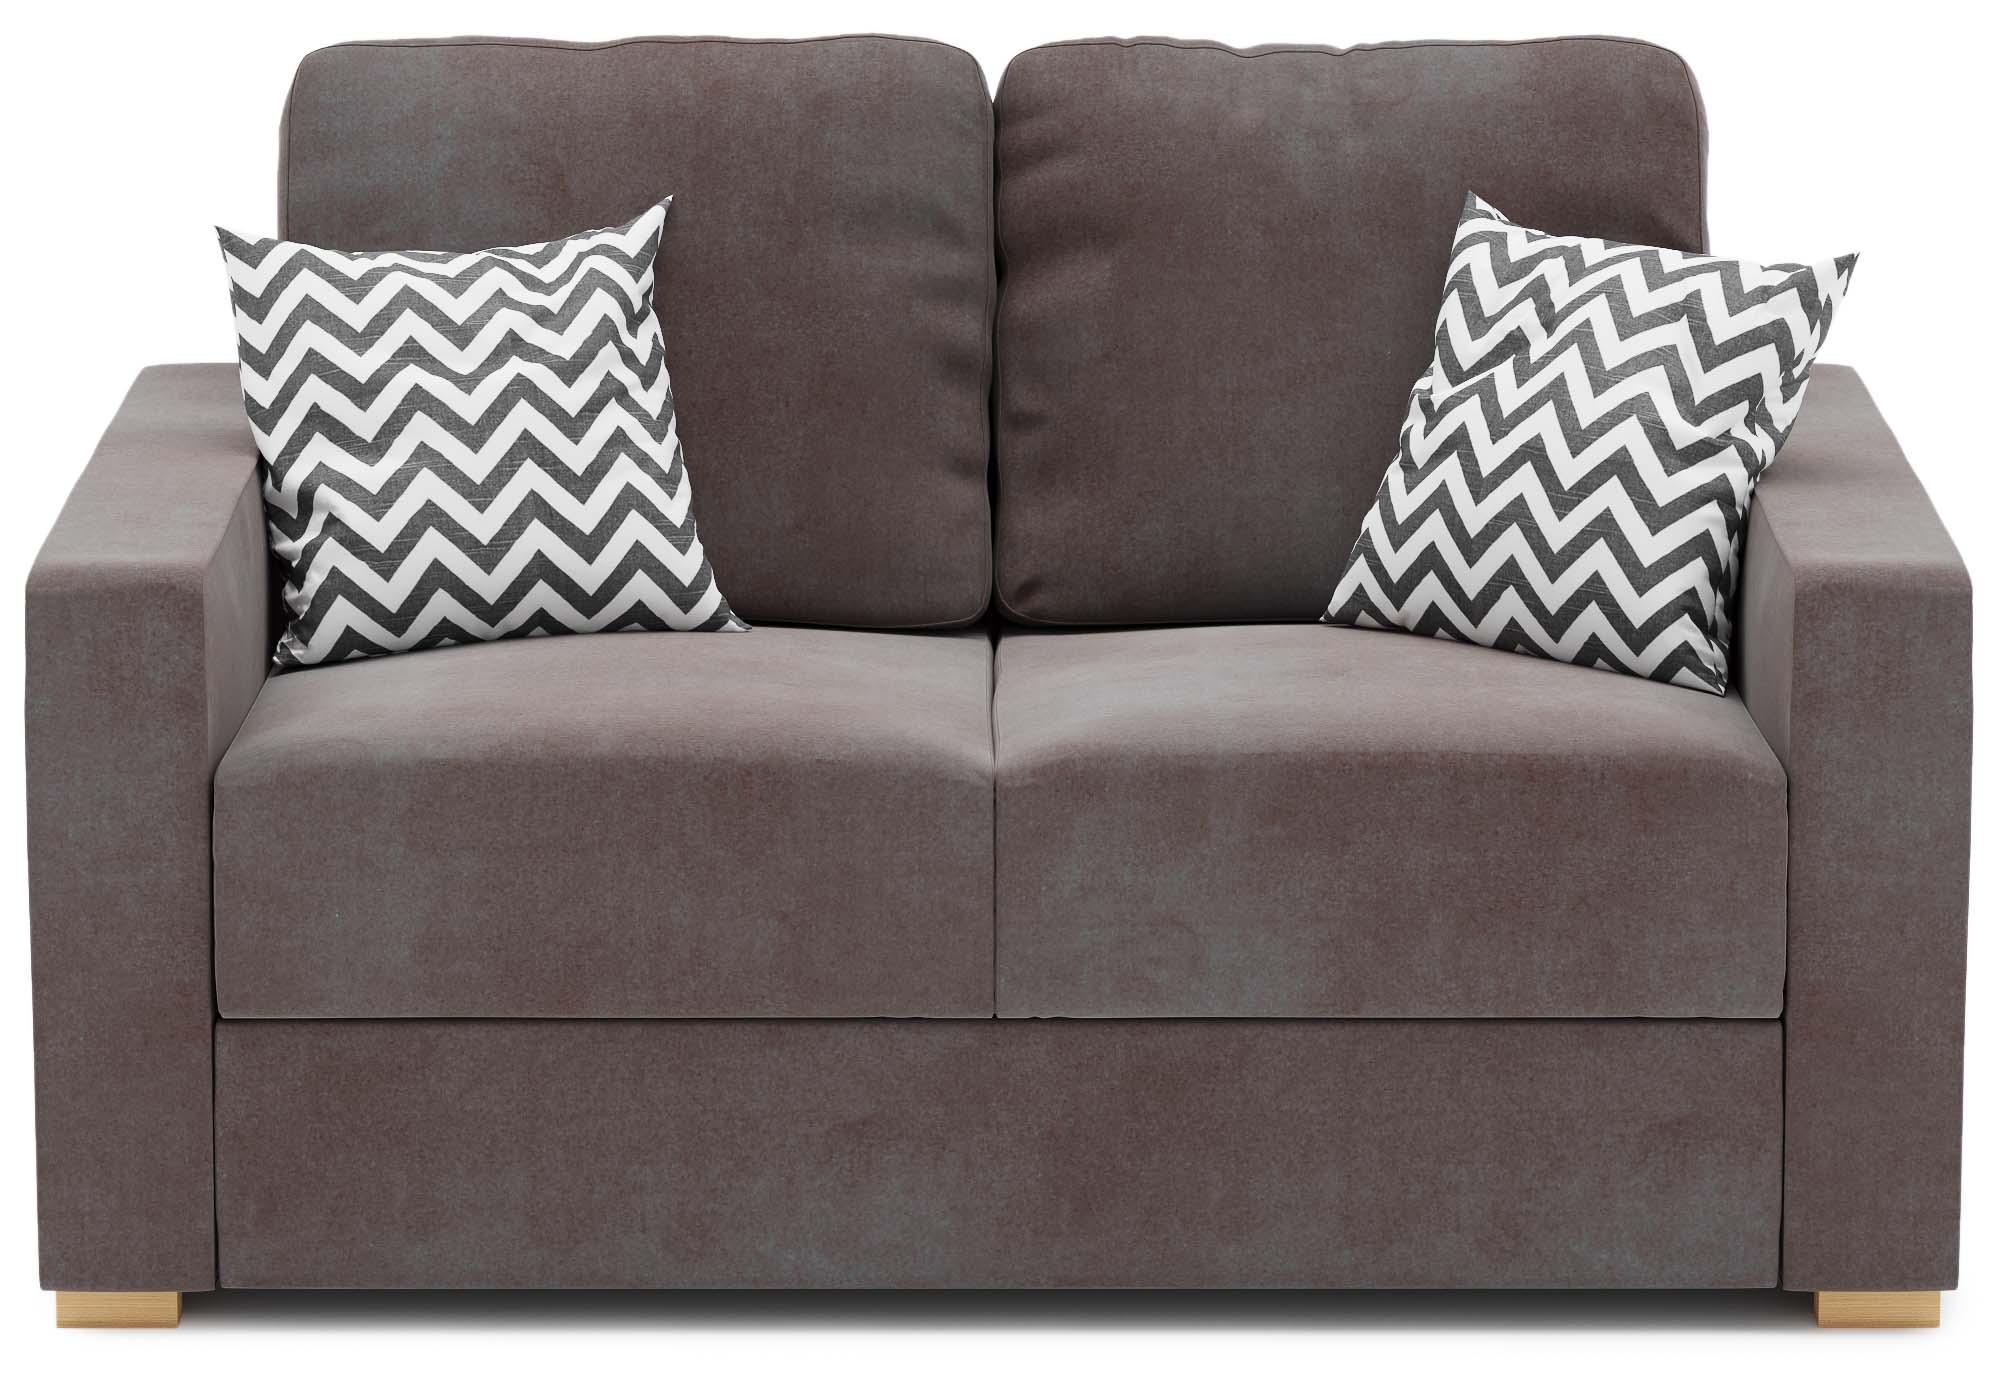 lear 2 seat sofa bed small sofa bed nabru. Black Bedroom Furniture Sets. Home Design Ideas